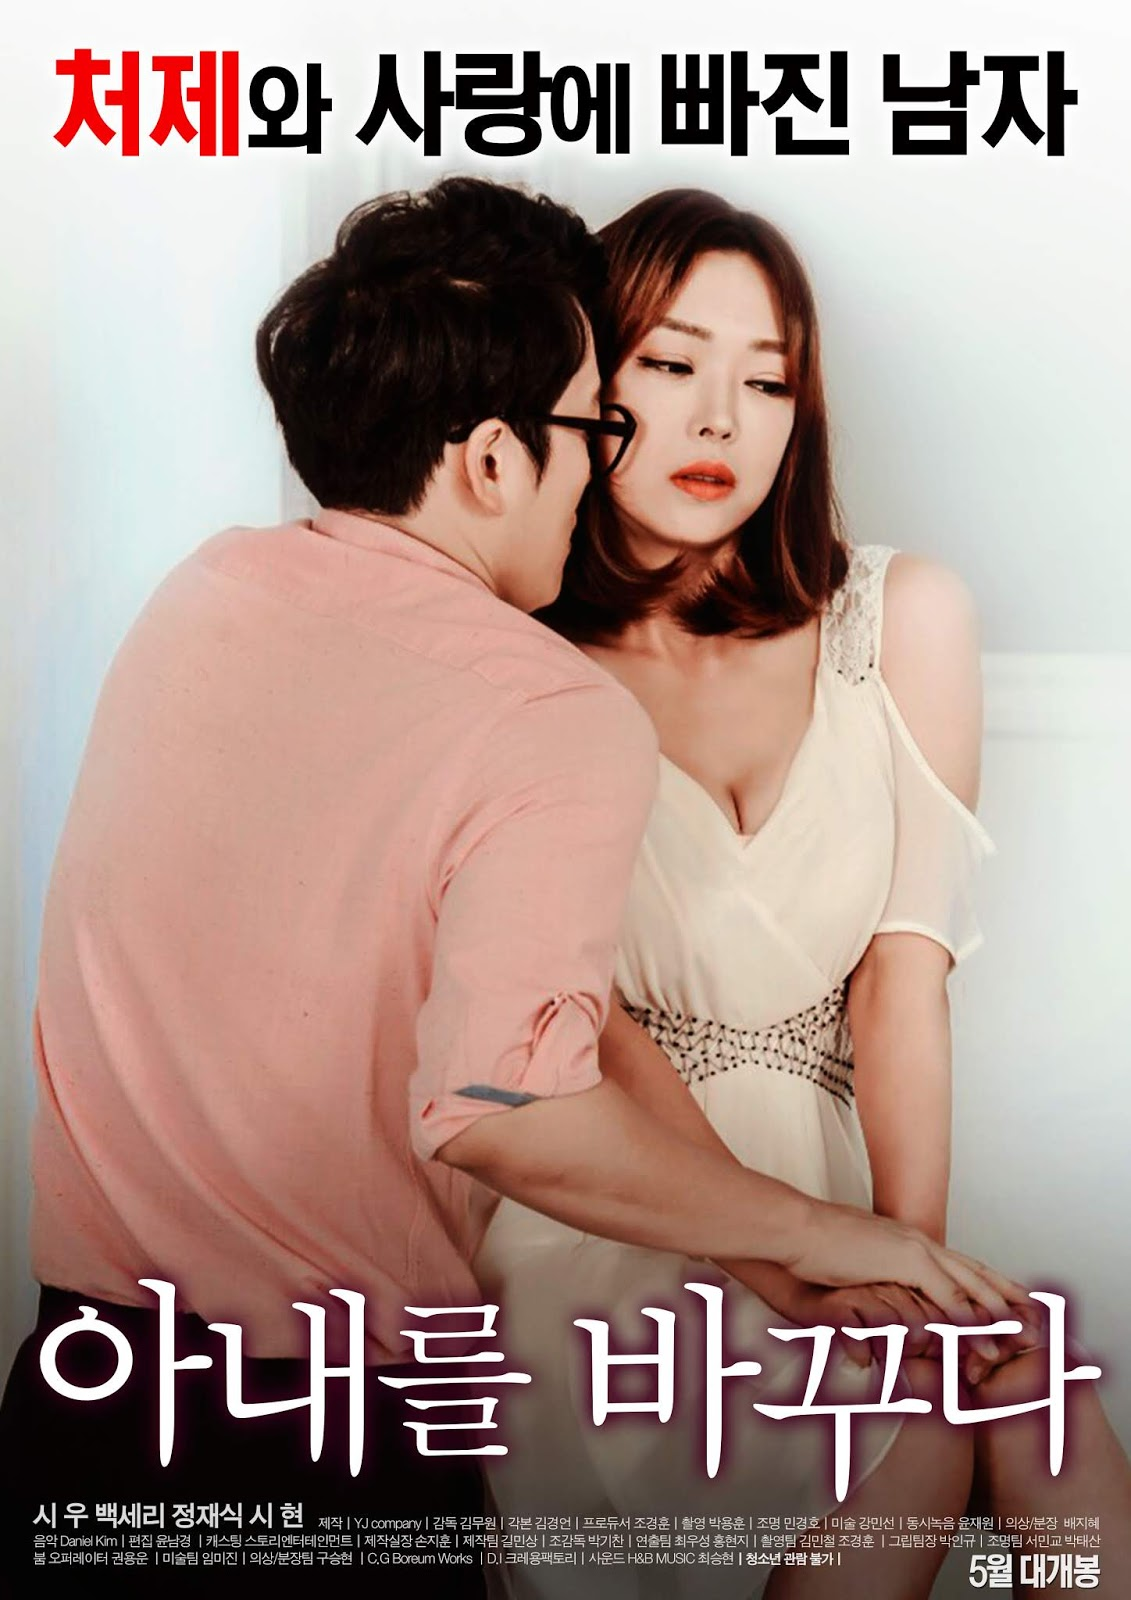 Change Wife Full Korea 18+ Adult Movie Online Free